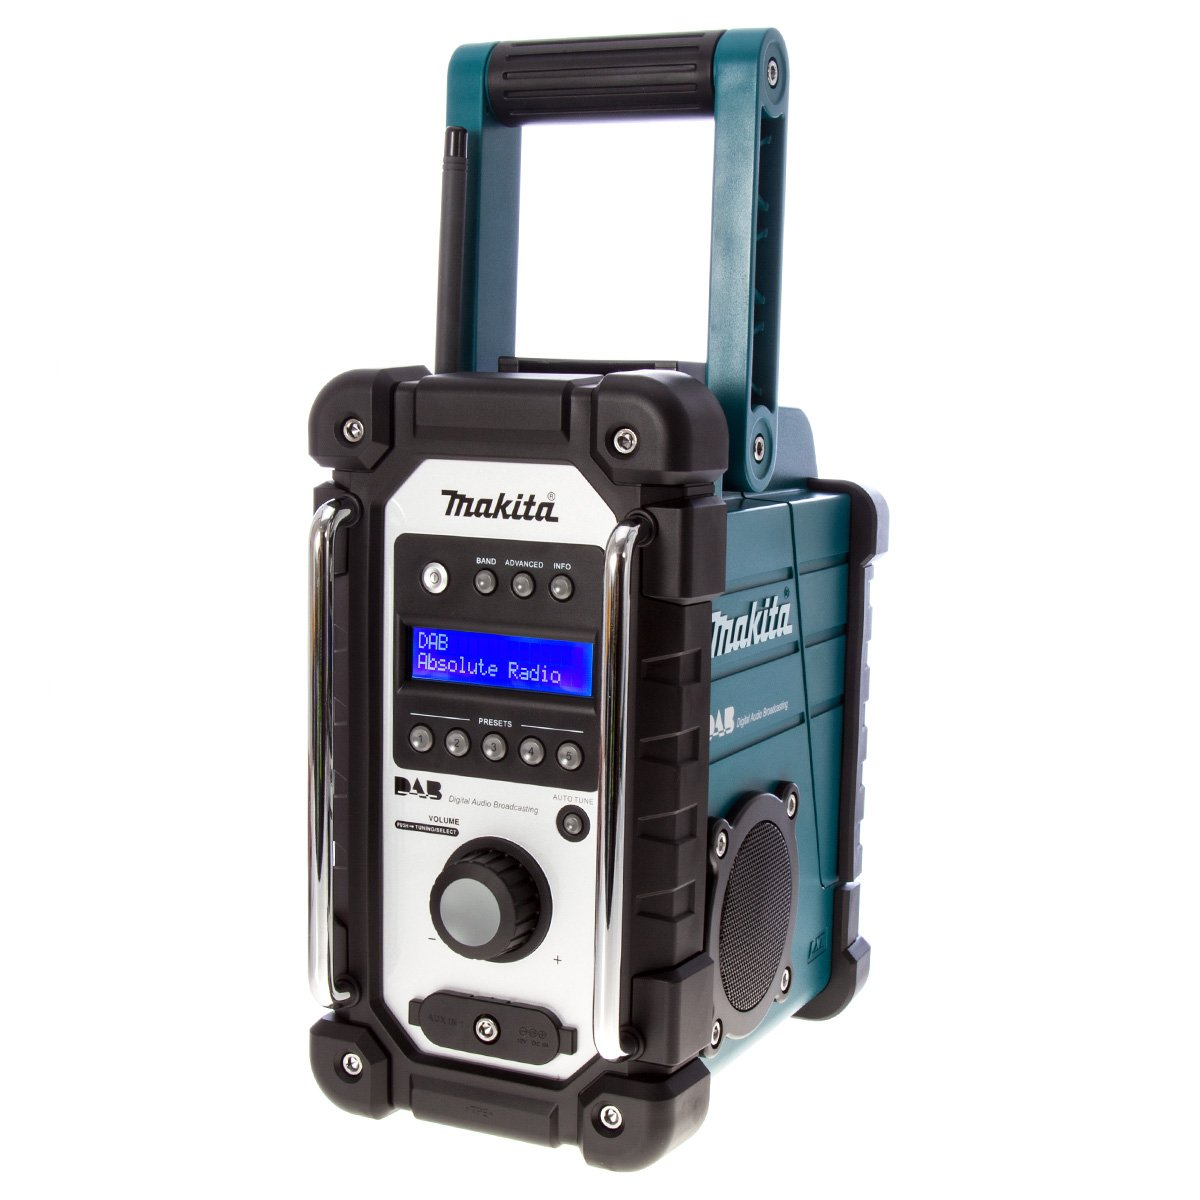 MAKITA Radio de chantier FM 7, 2-18V et un adaptateur secteur 230V DMR104